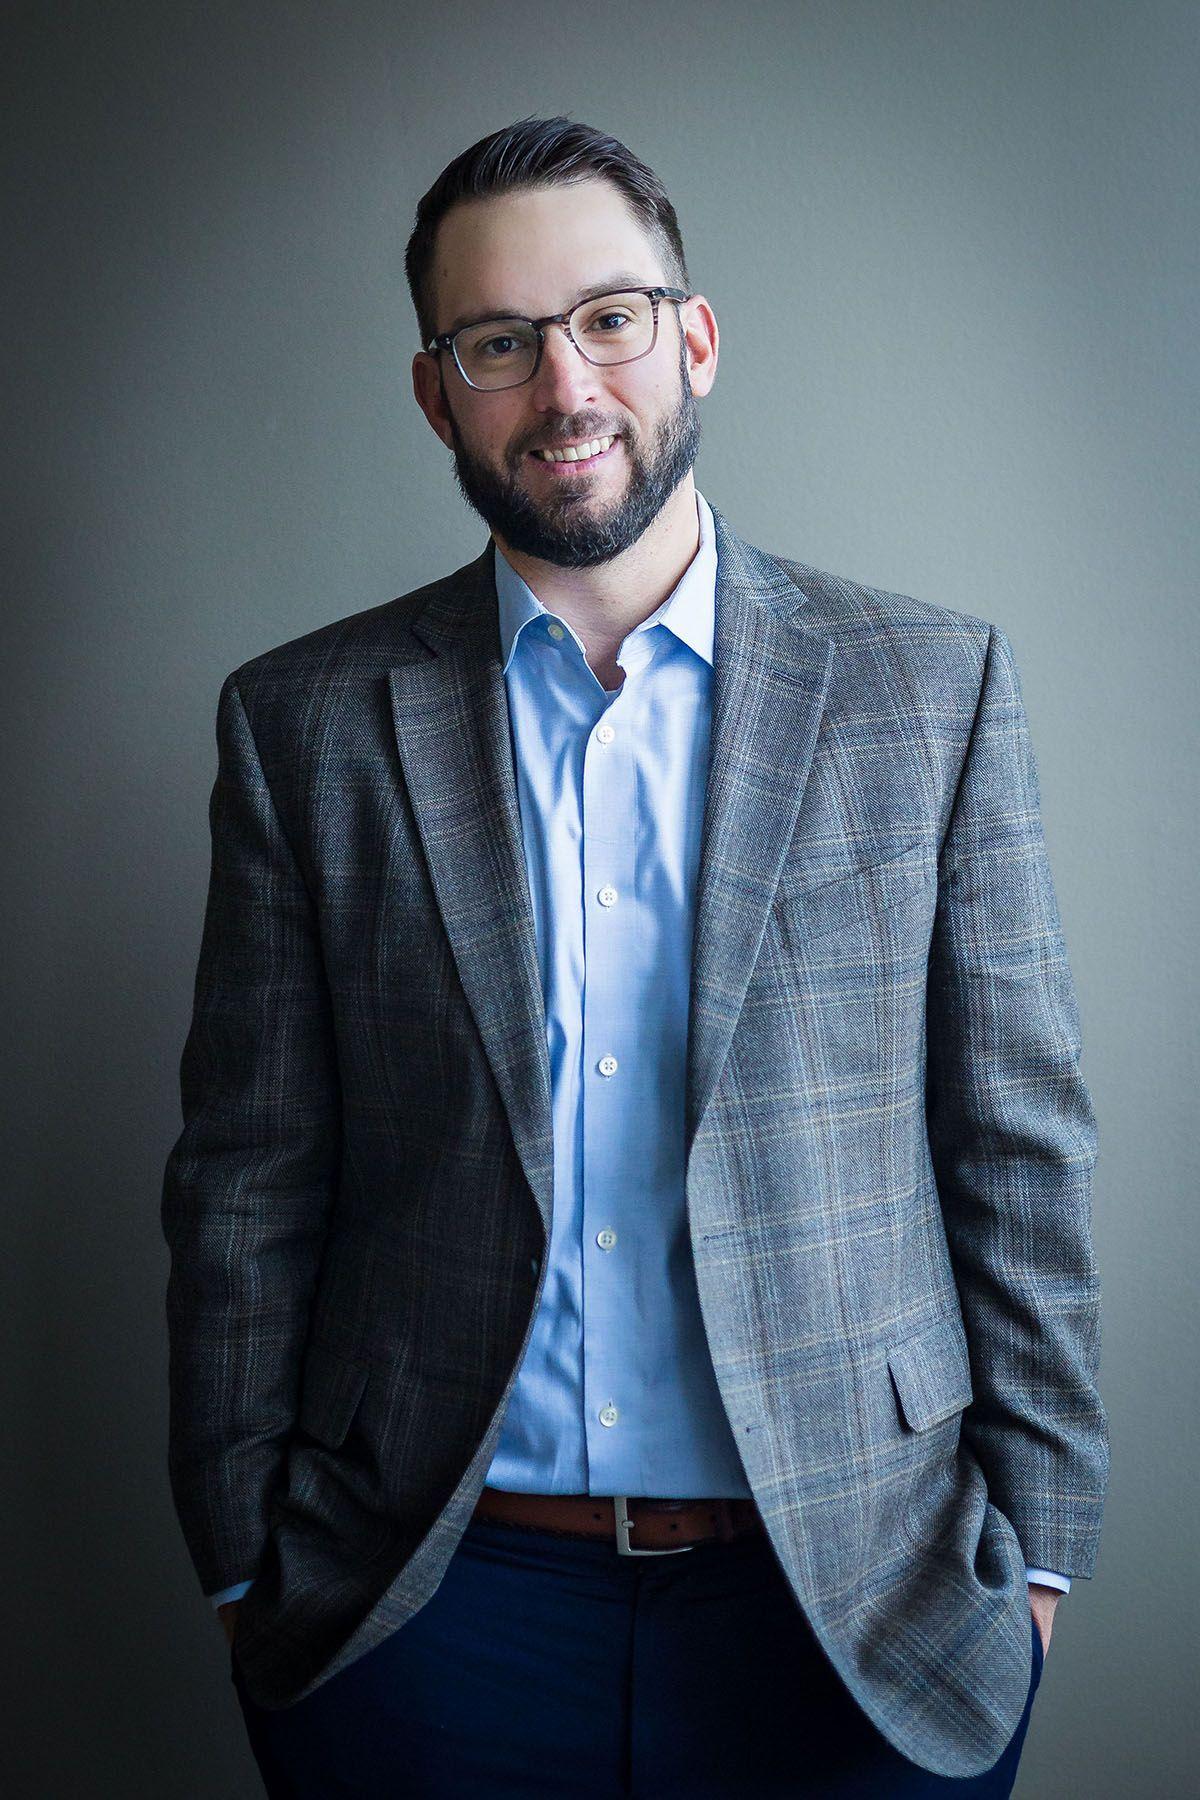 James E Fogg Commercial And Contract Litigation Trial Lawyer Denver Colorado.